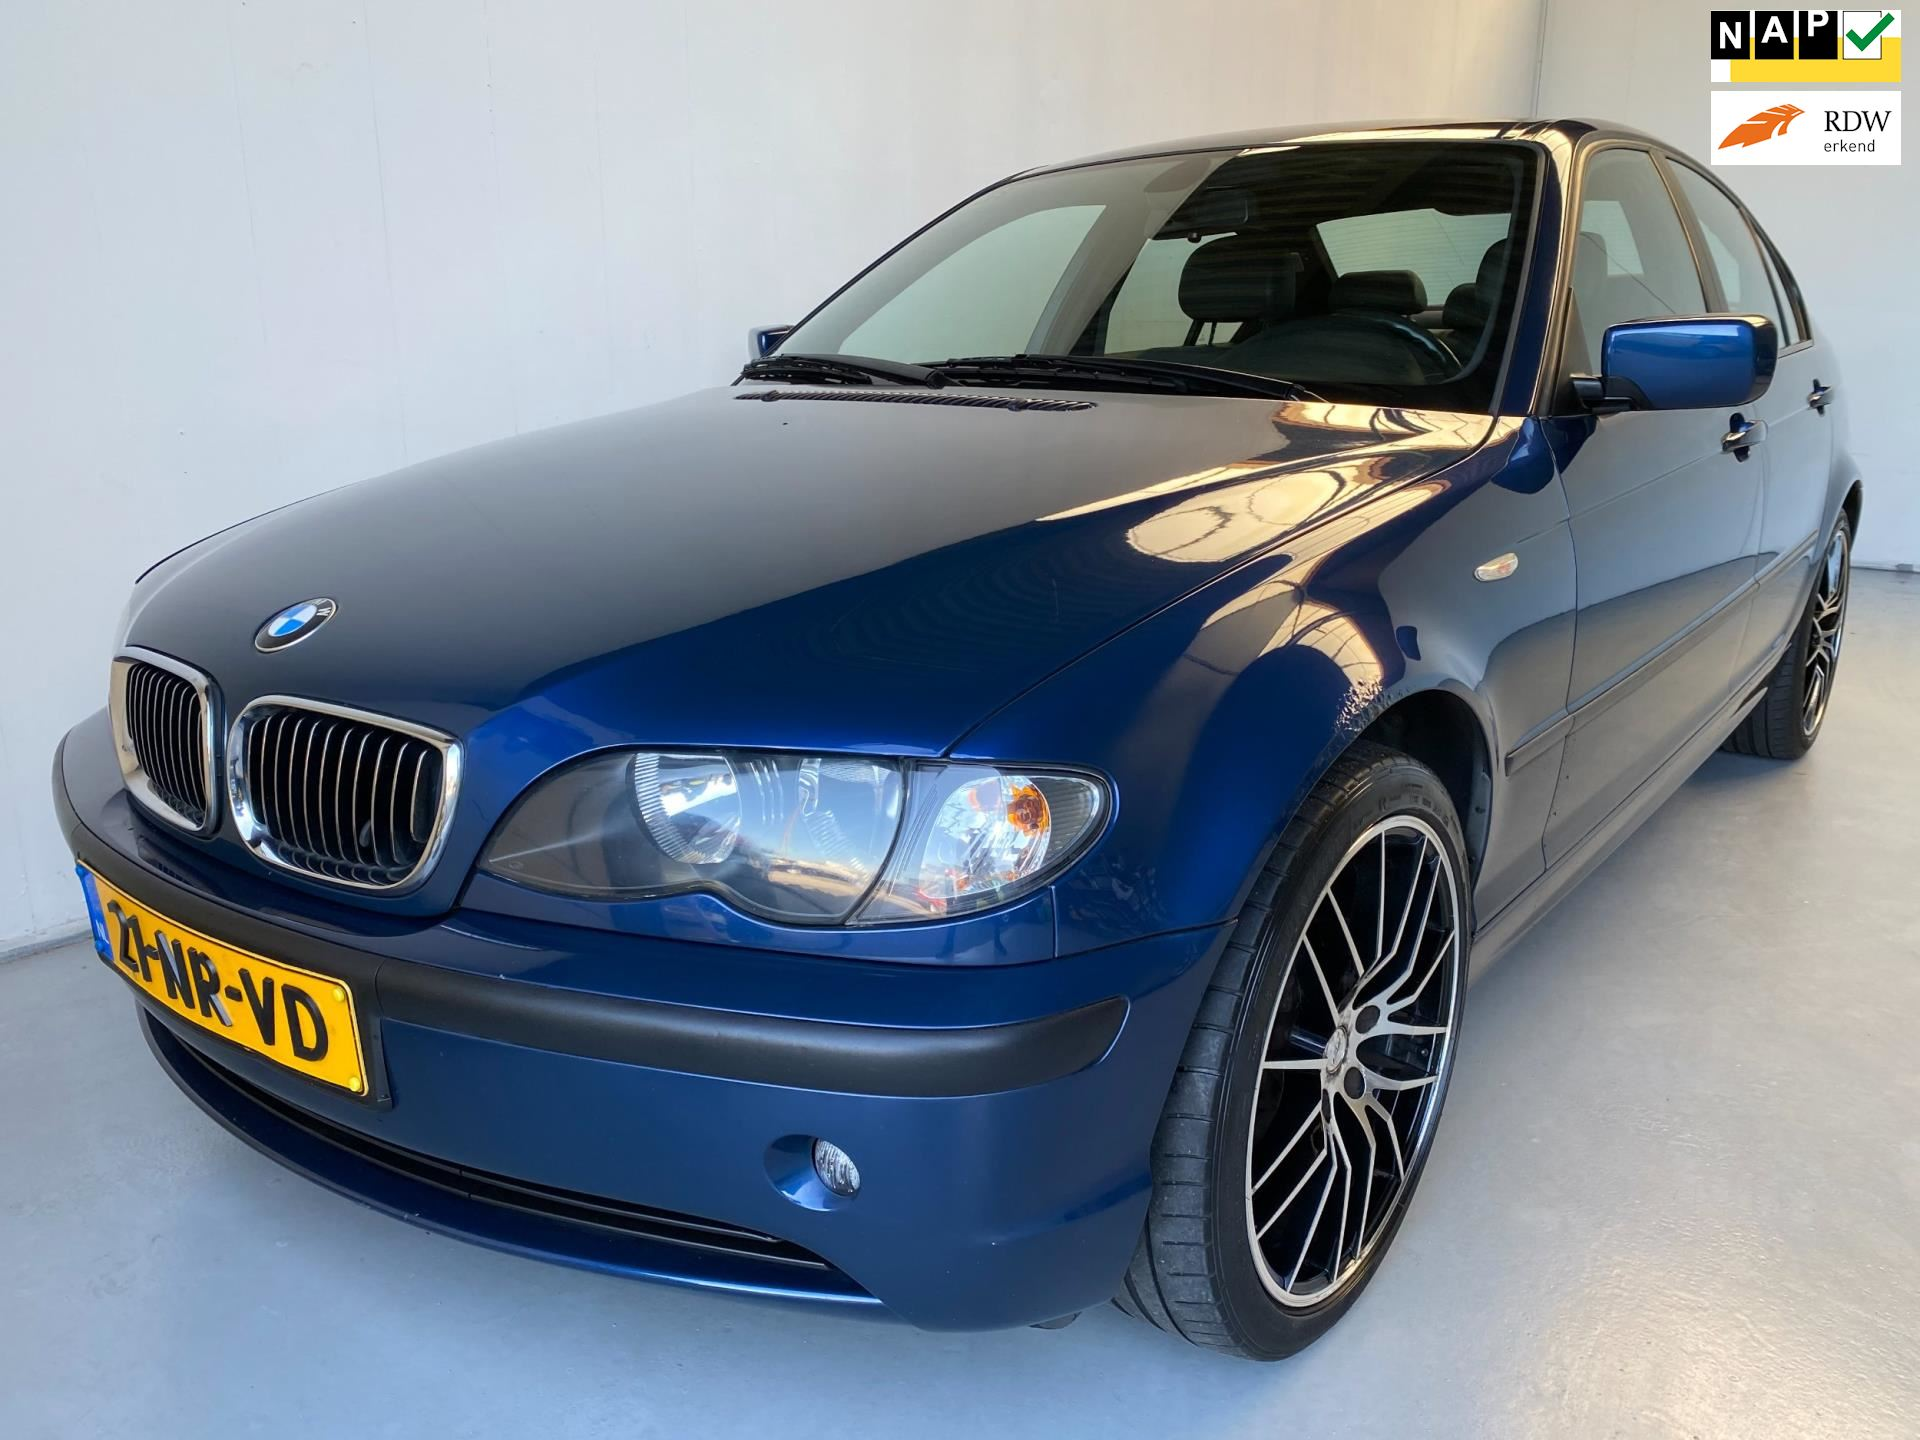 BMW 3-serie occasion - Autobedrijf Leeuwis B.V.